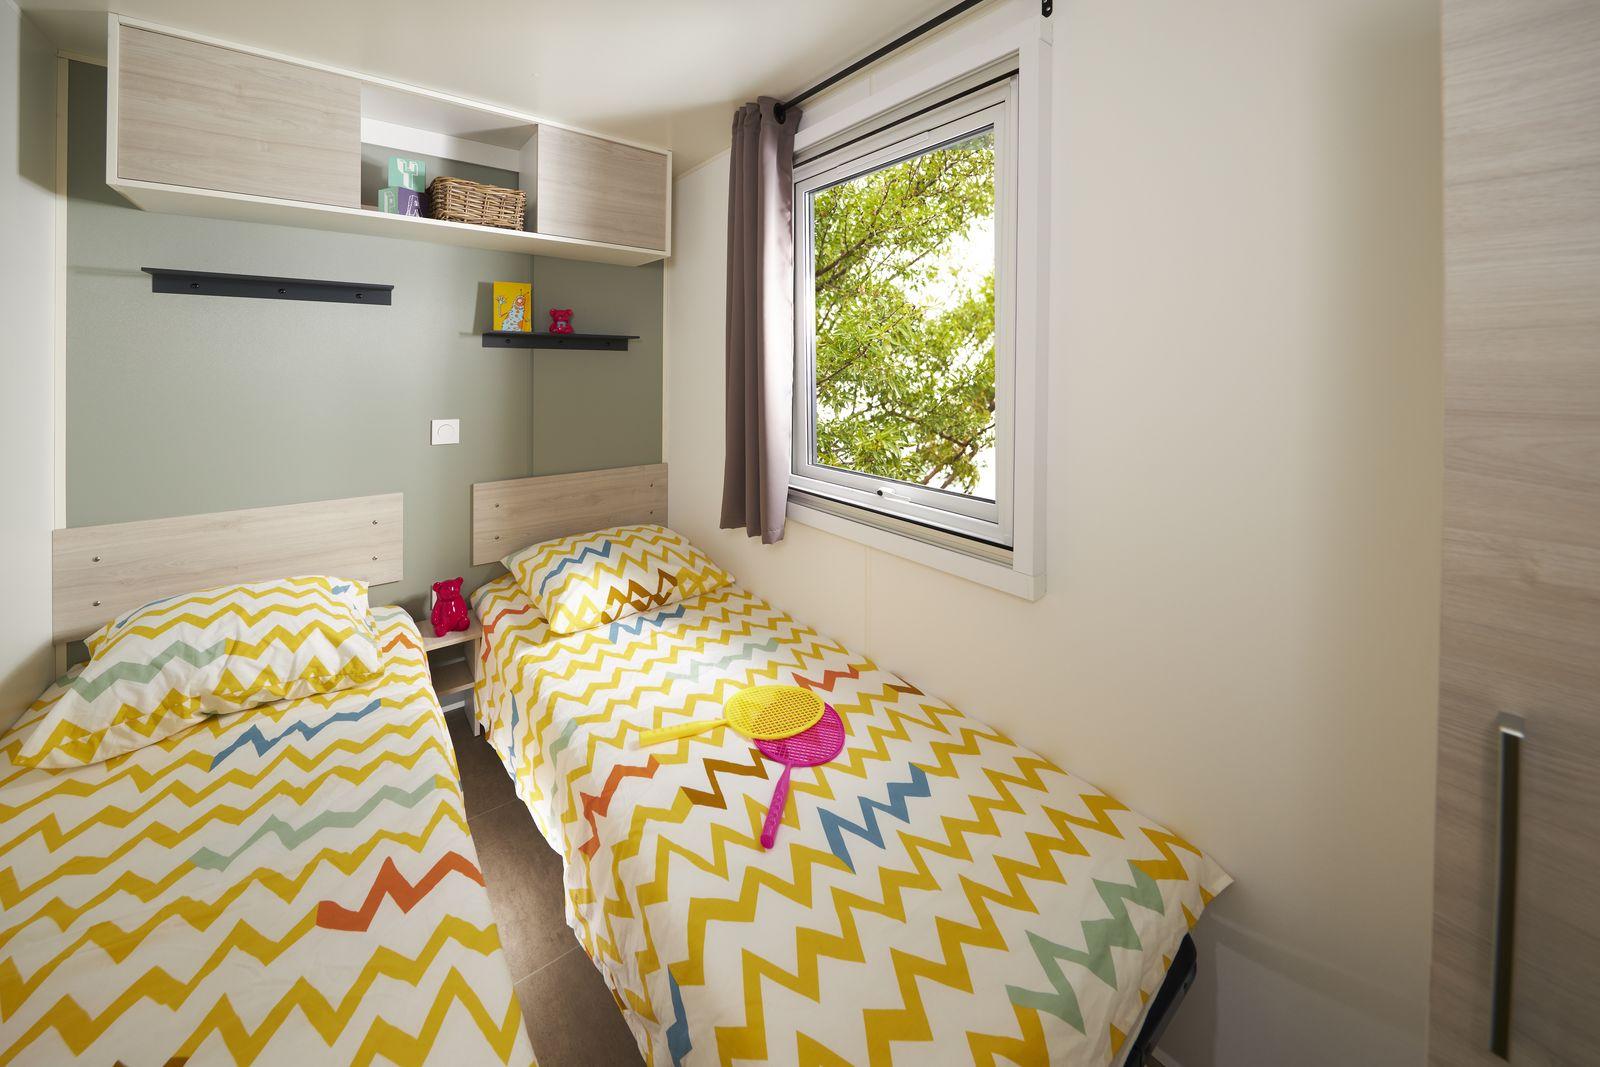 residences-trigano-mobil-home-2chambres-evolution29ti-chambre-enfants